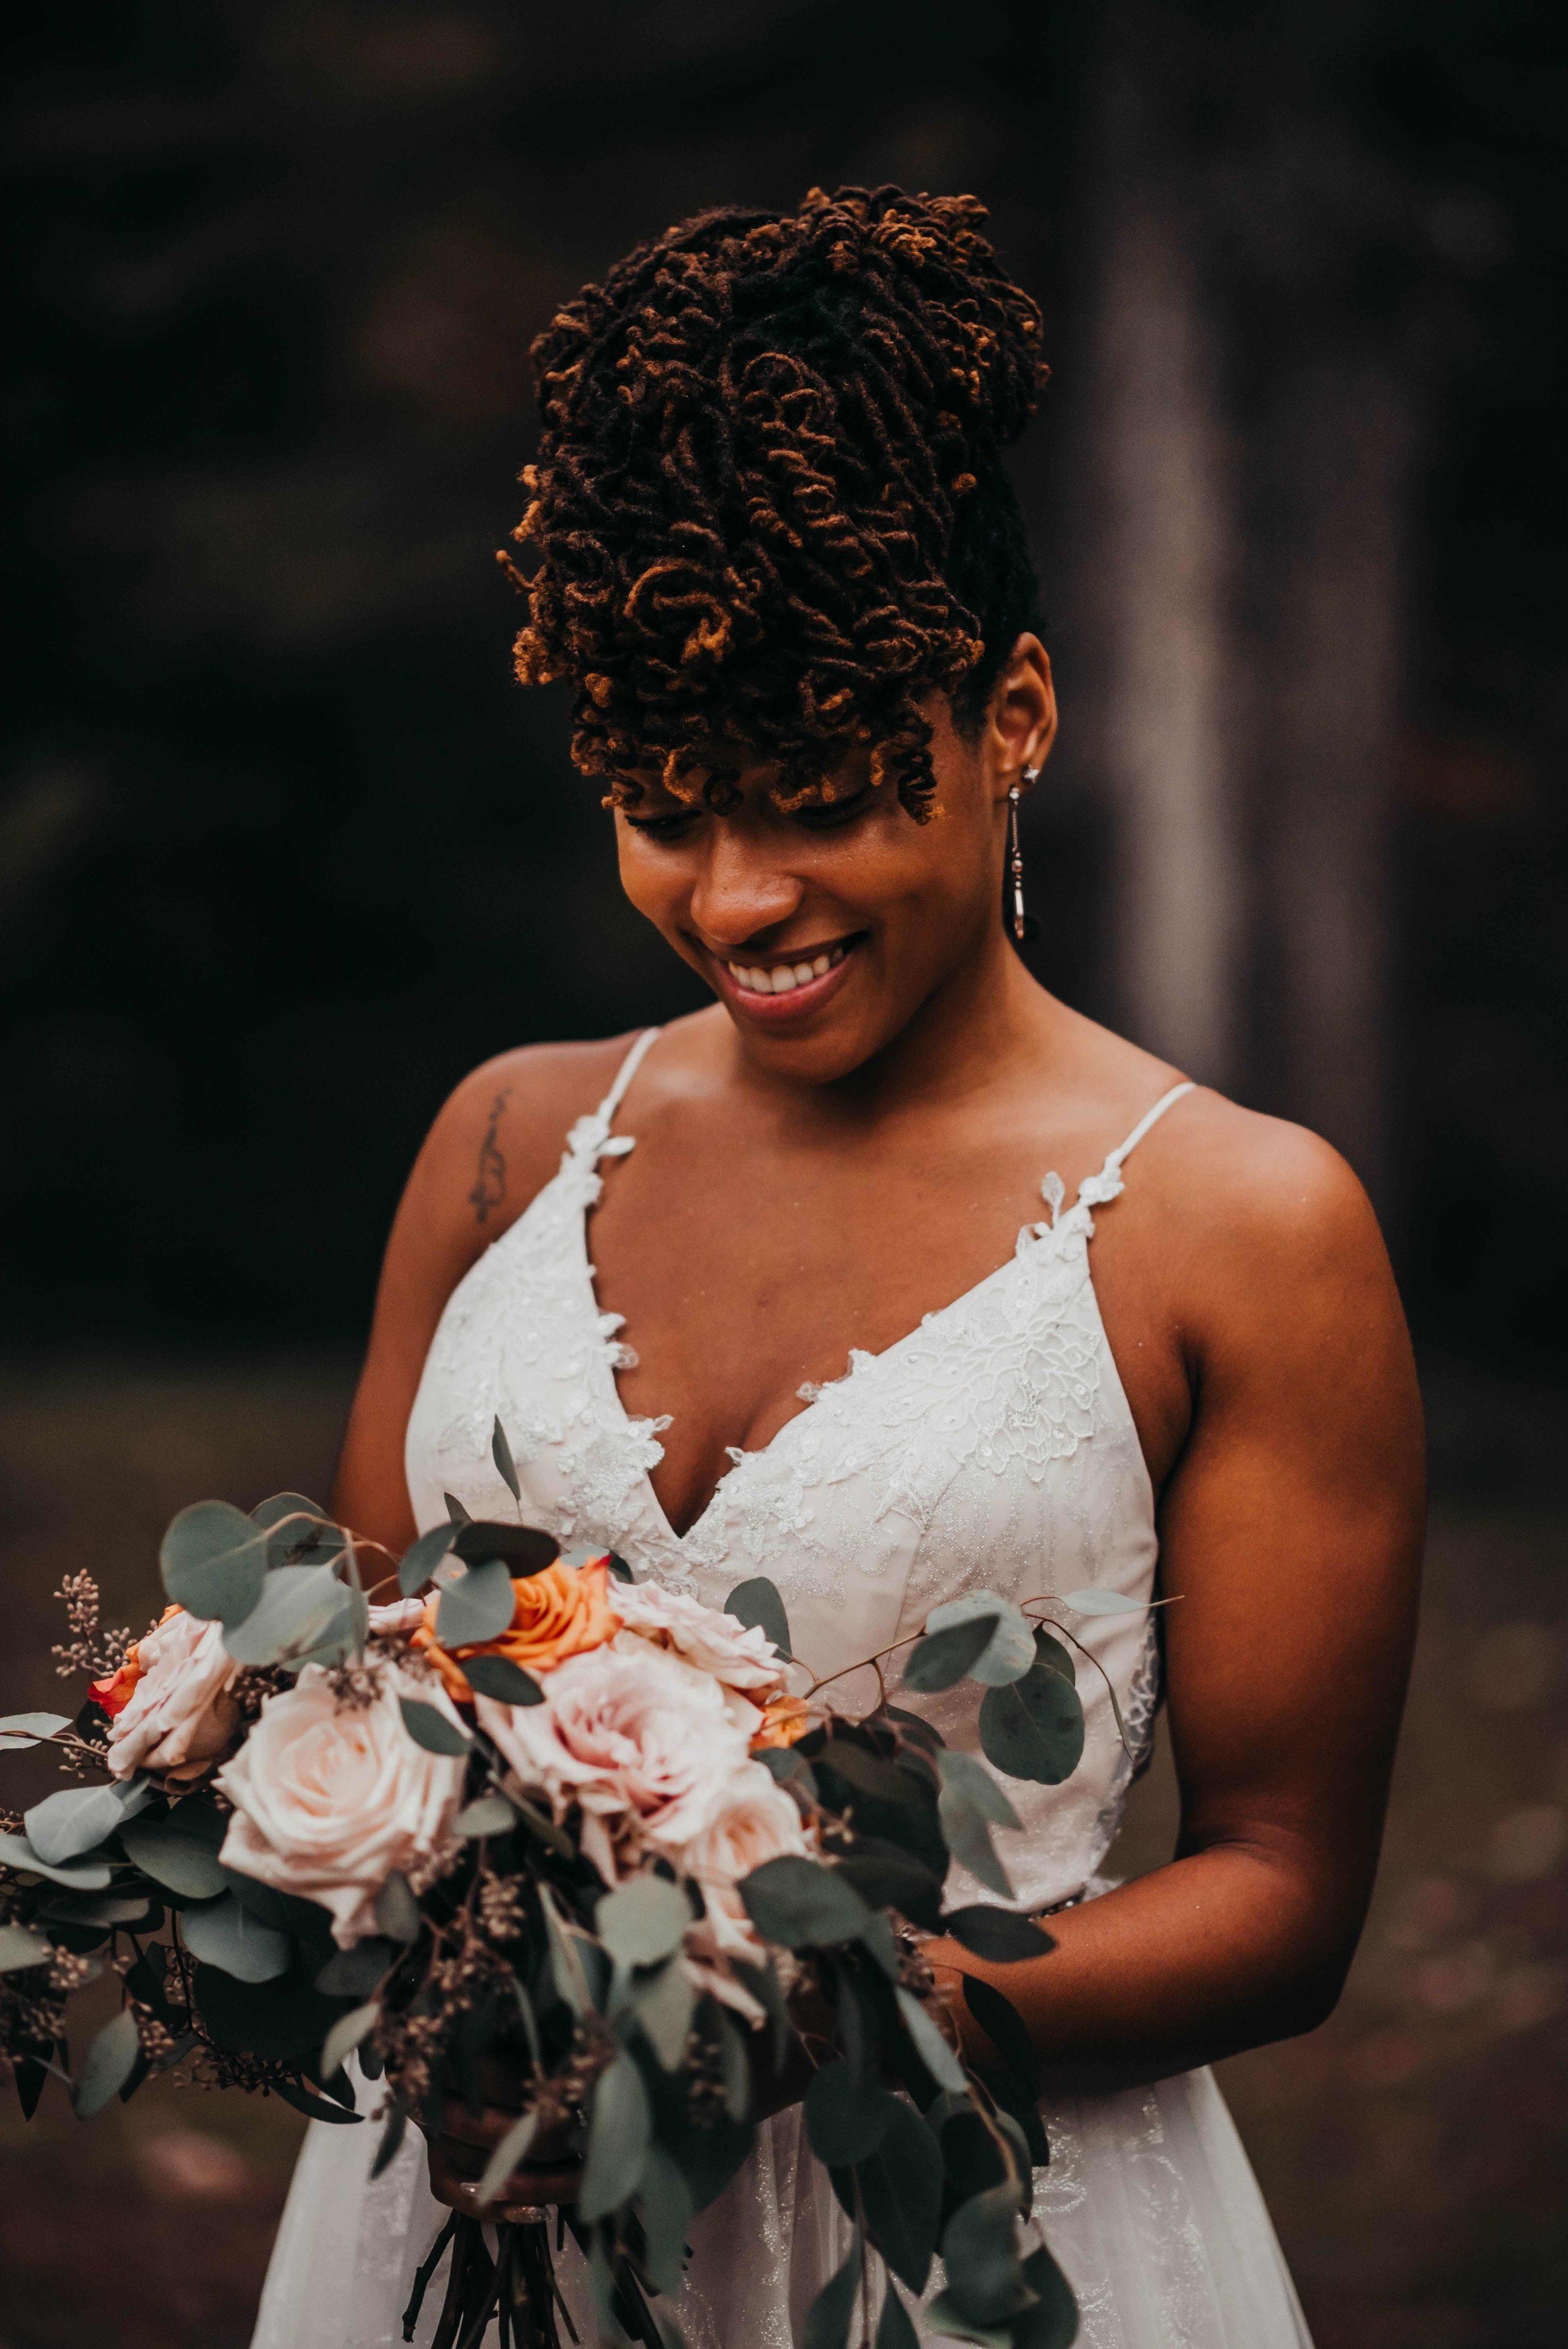 Detail shot of bride's dress